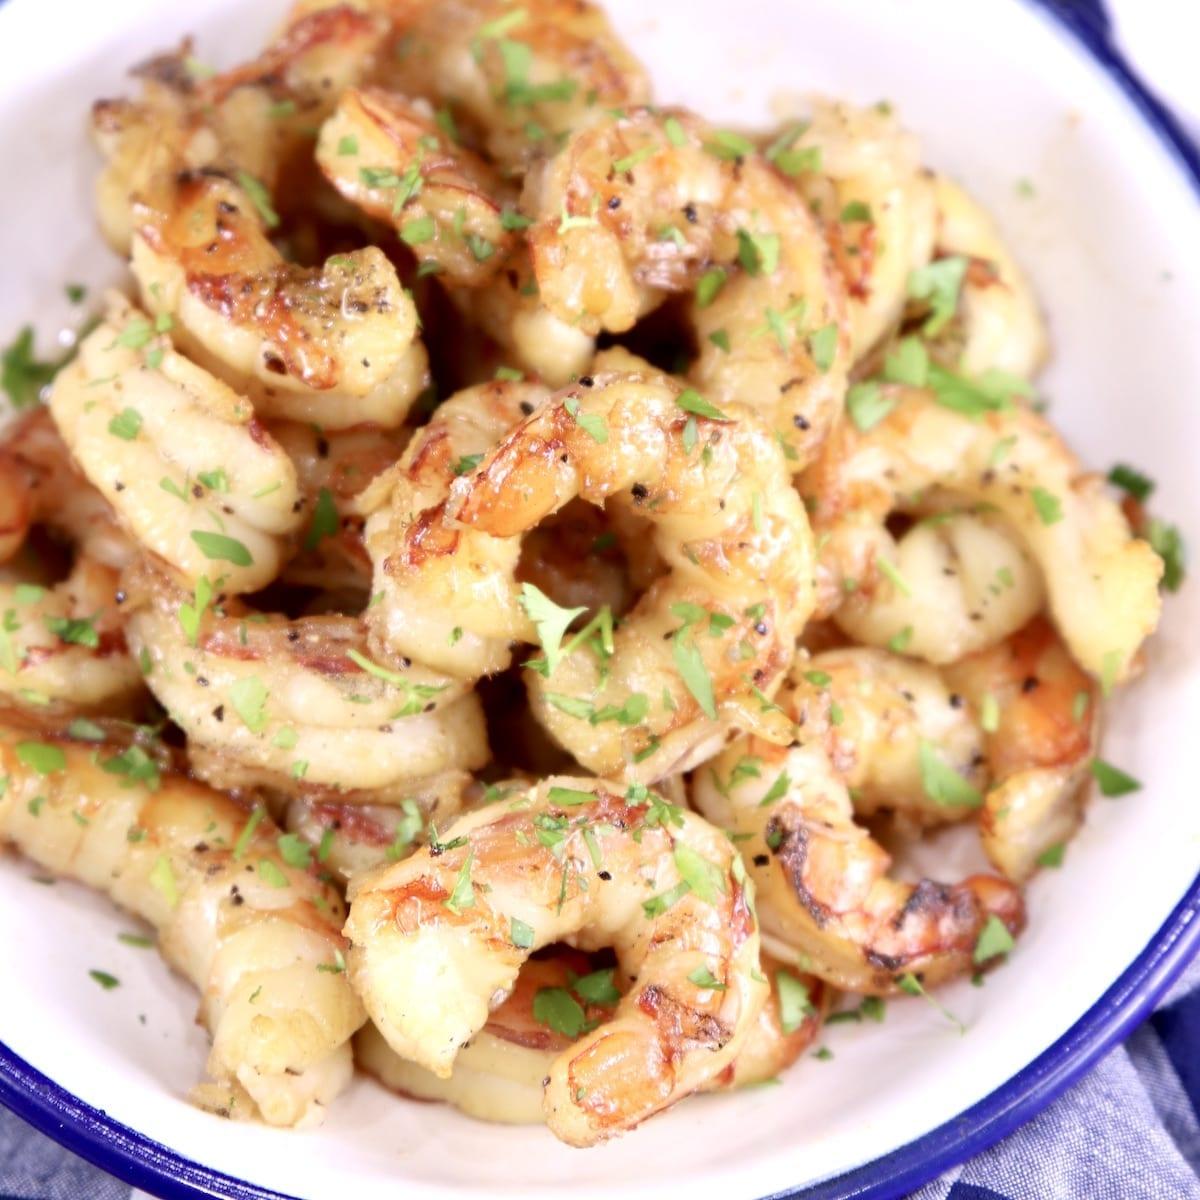 Bowl of honey garlic grilled shrimp - close up view